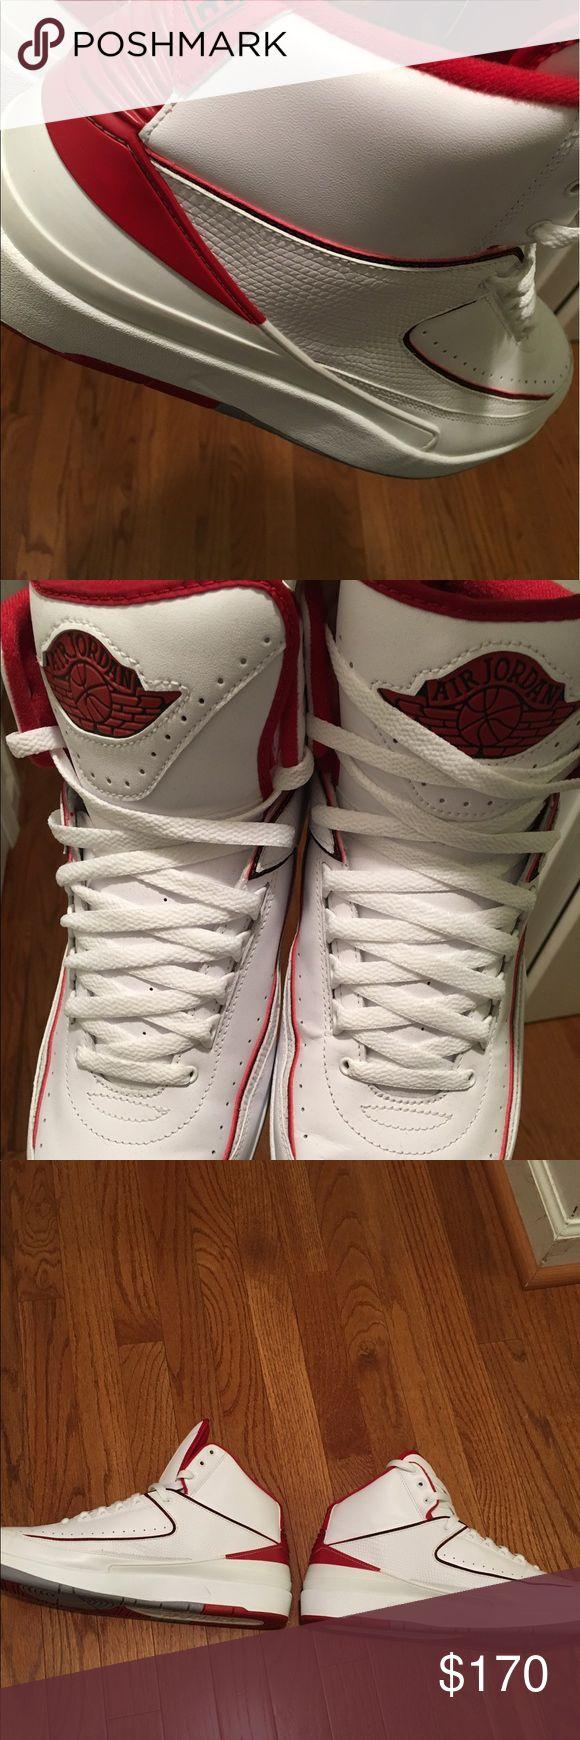 Jordan Retro 2 red/white lightly worn Jordan Retro 2 white/red Jordan Shoes Athletic Shoes